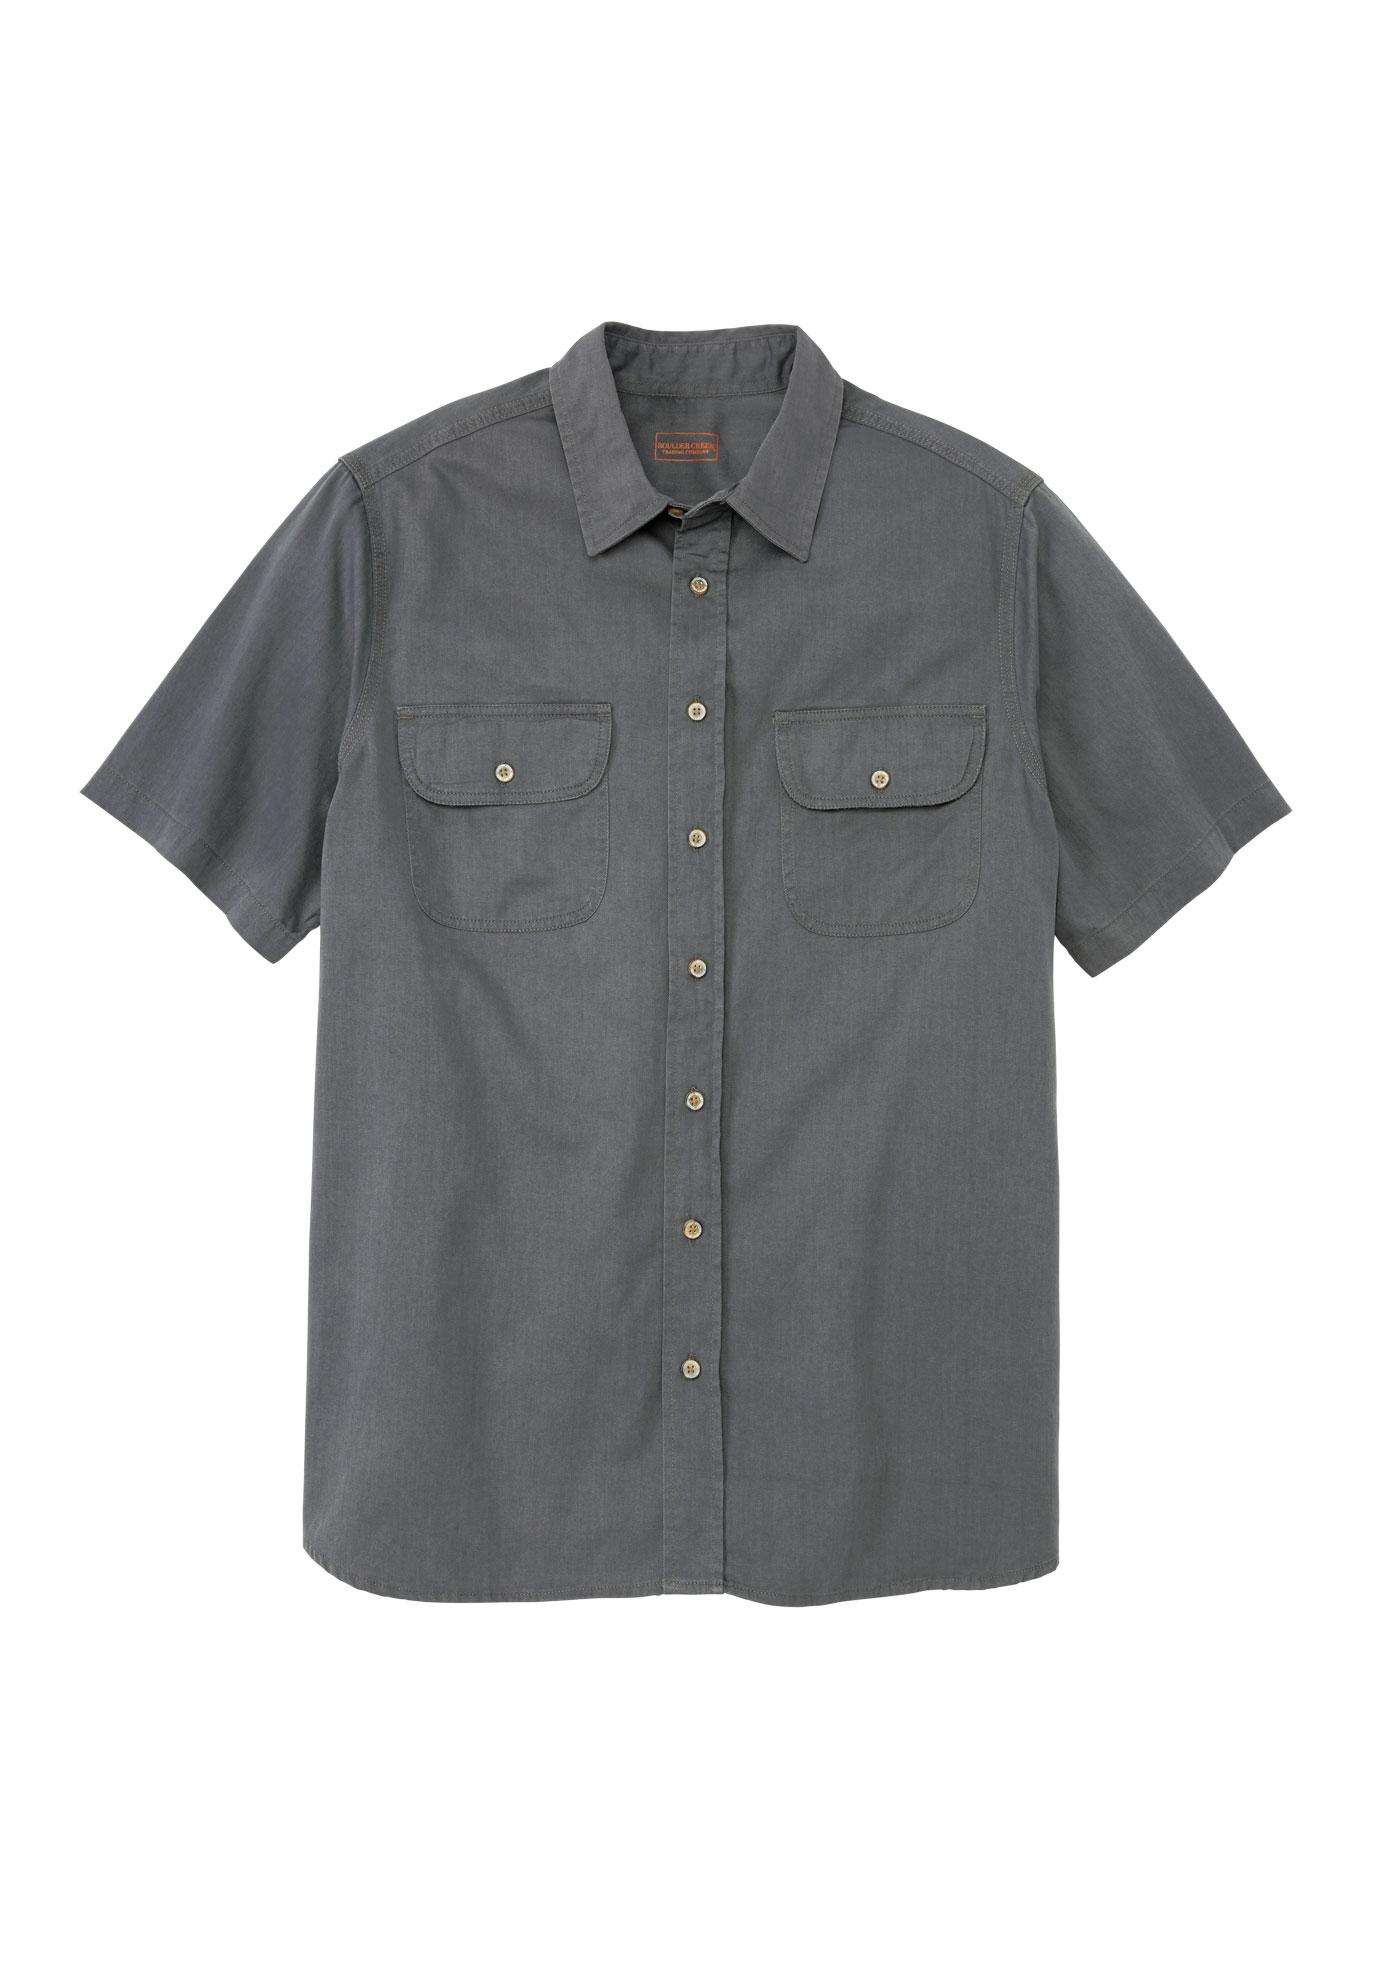 I like this shirt Men/'s tee Shirt Pick Size SM 6XL /& Color Don/'t make me flex